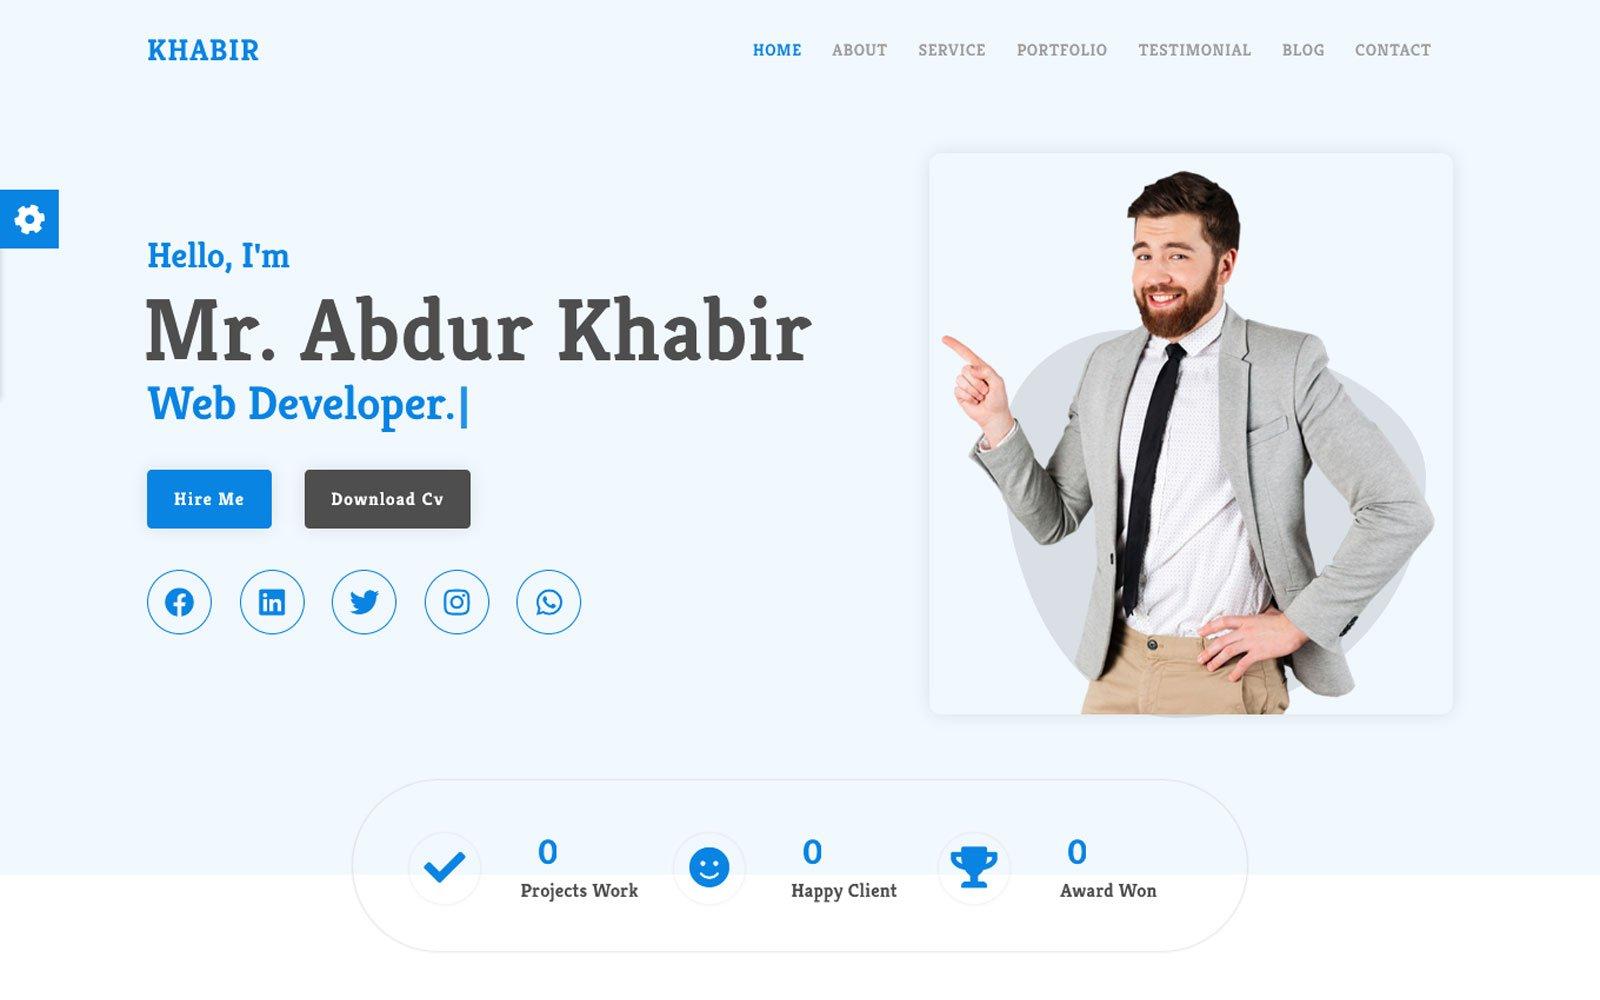 Al-Khabir - Creative Portfolio CV/Resume №122887